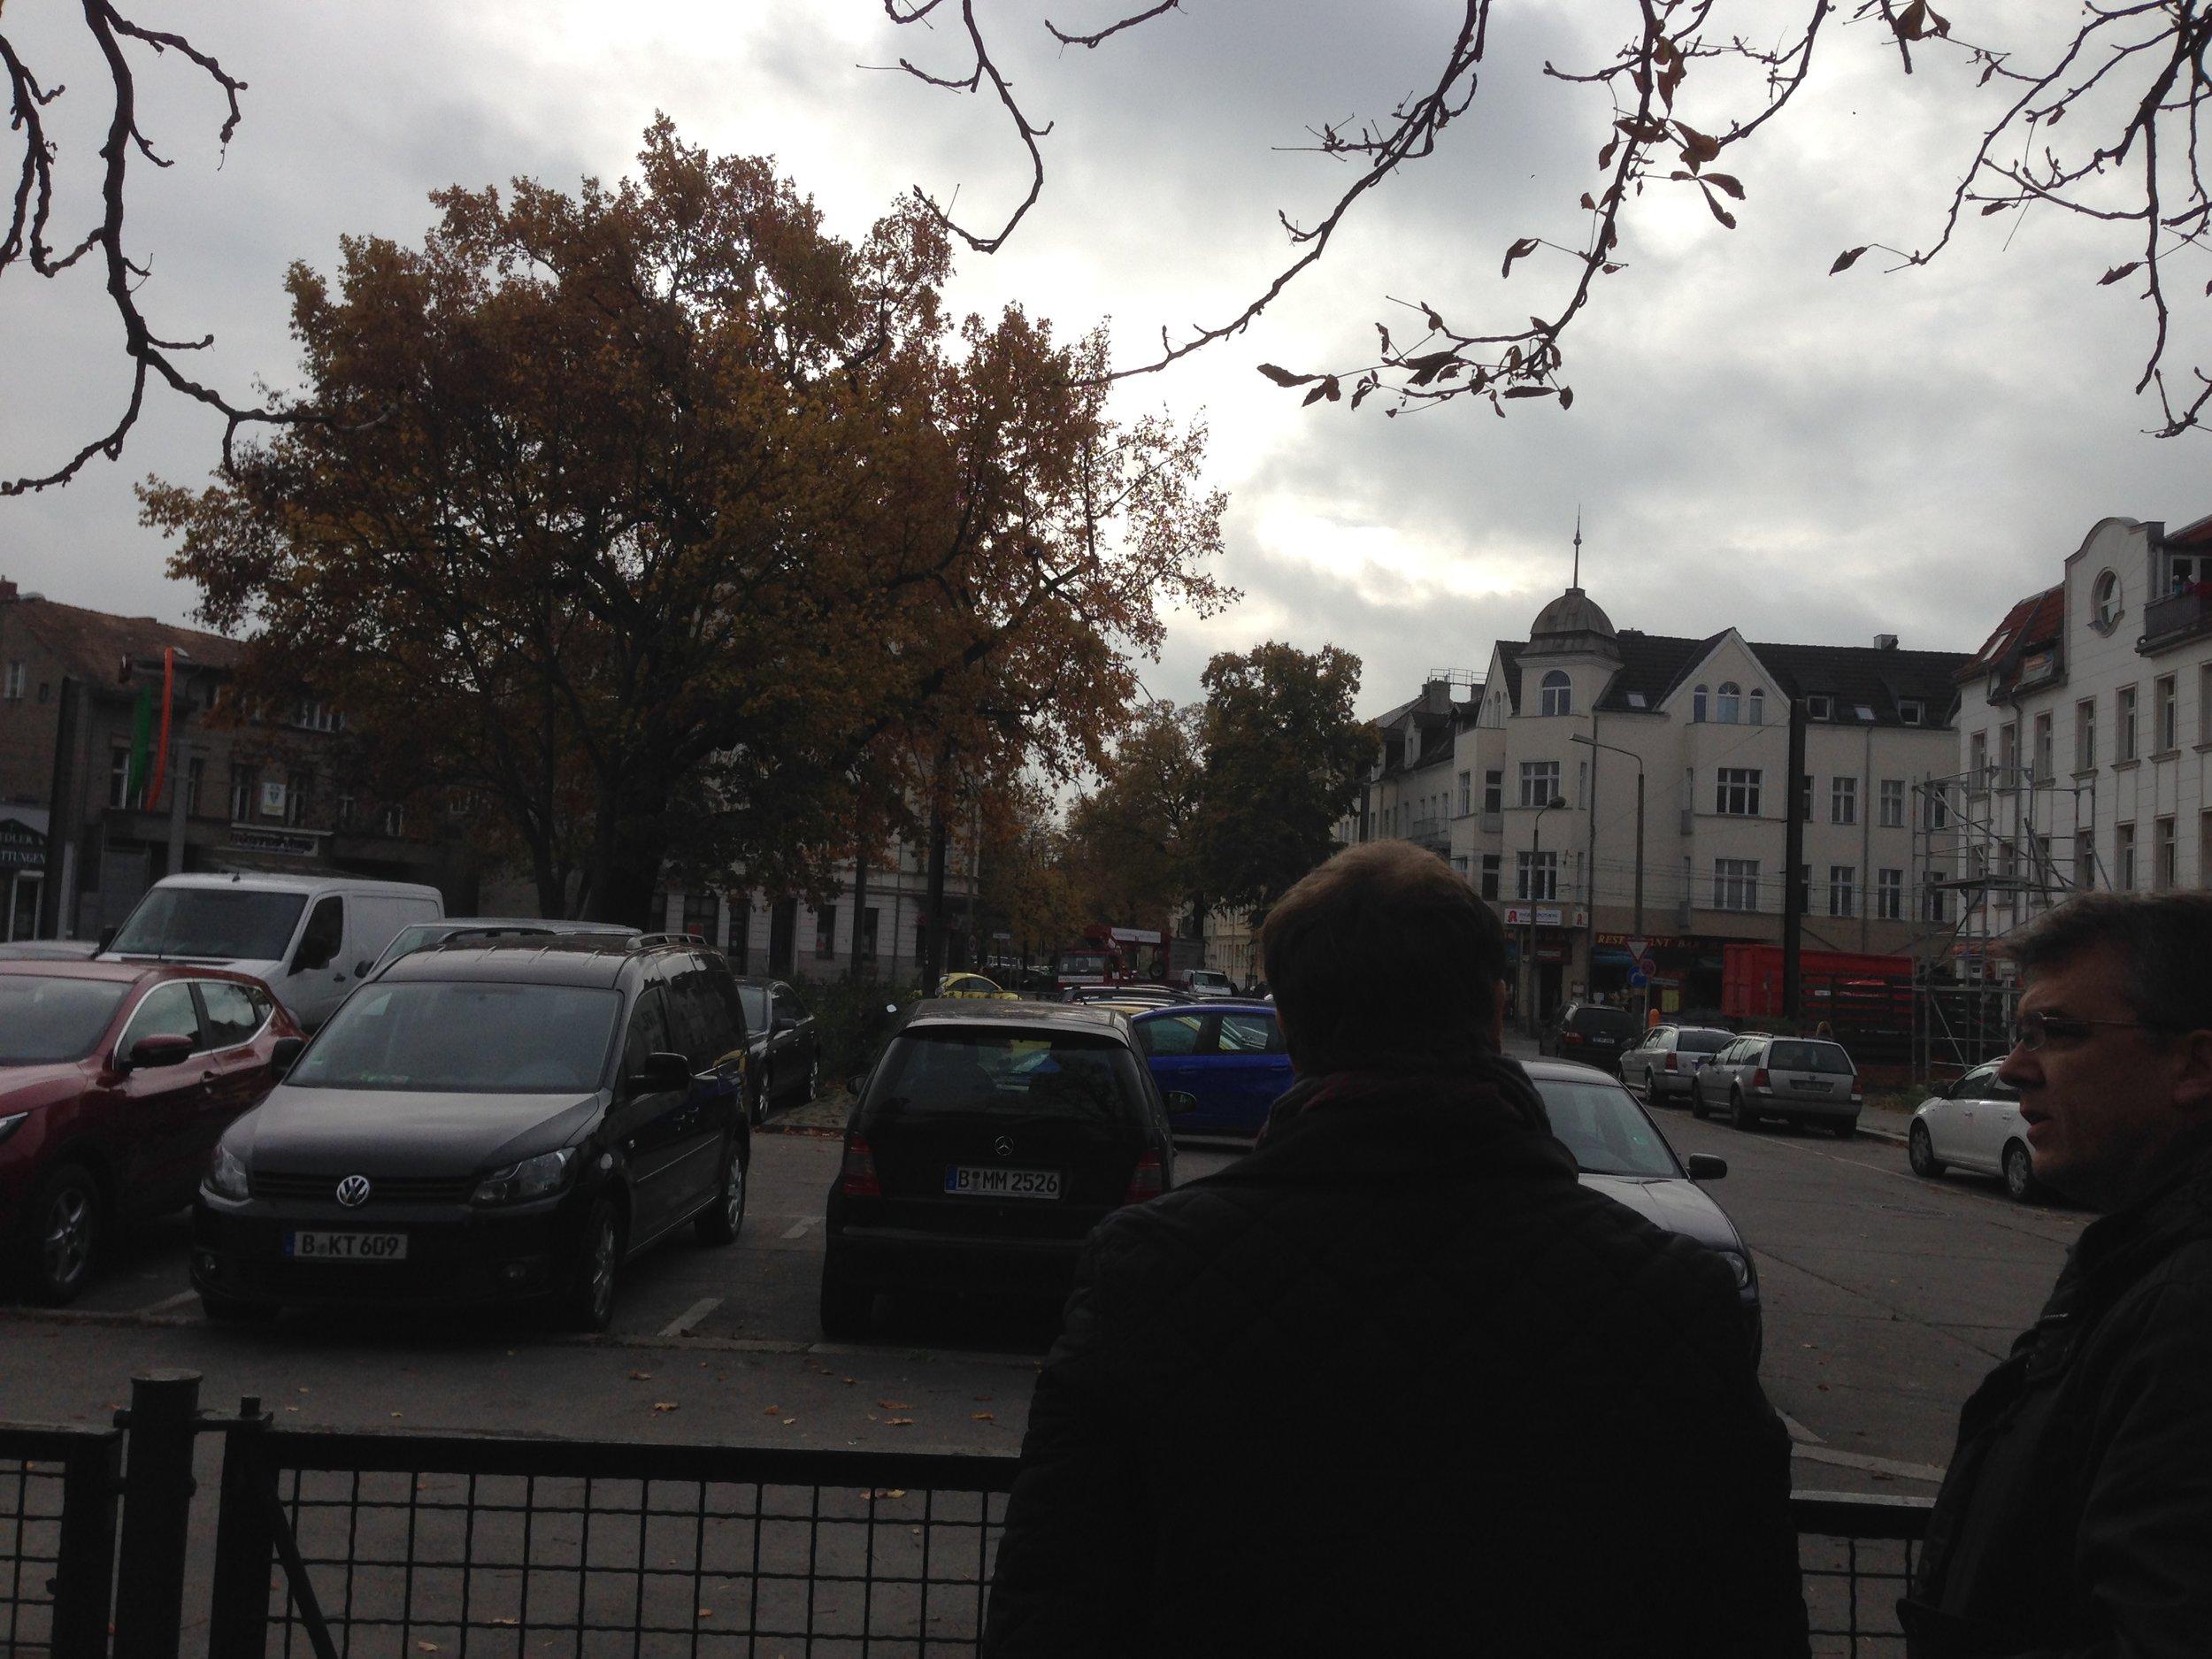 141106_Ossietzkyplatz Pfarrer Minkner 1